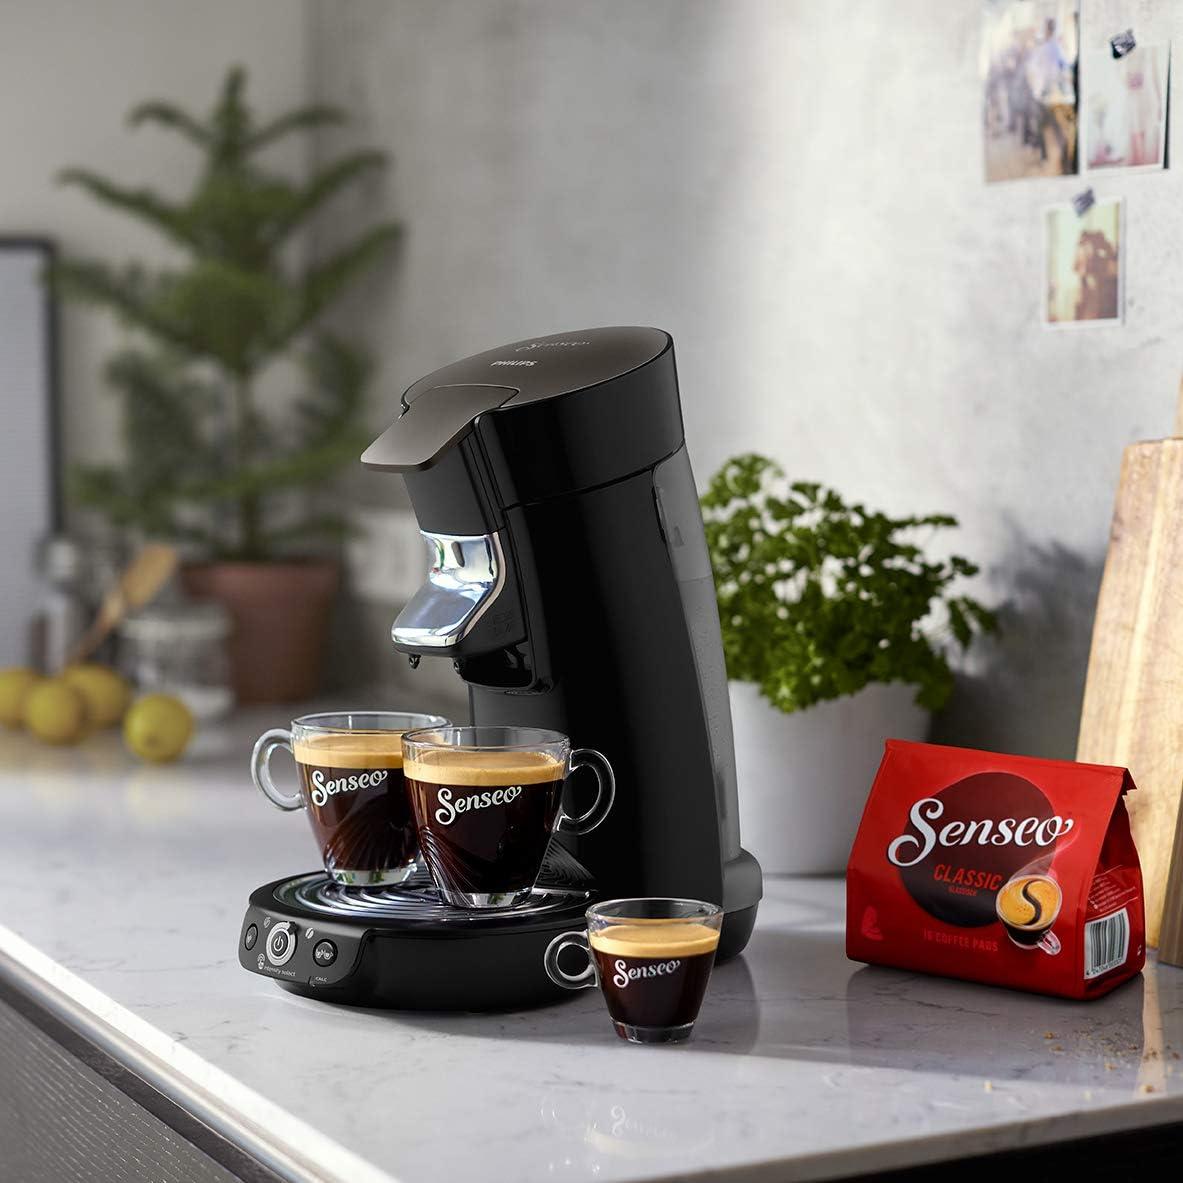 schwarz, General/überholt Crema plus, Kaffee-St/ärkeeinstellung Philips Senseo HD6564//60R1 Viva Caf/é Kaffeepadmaschine